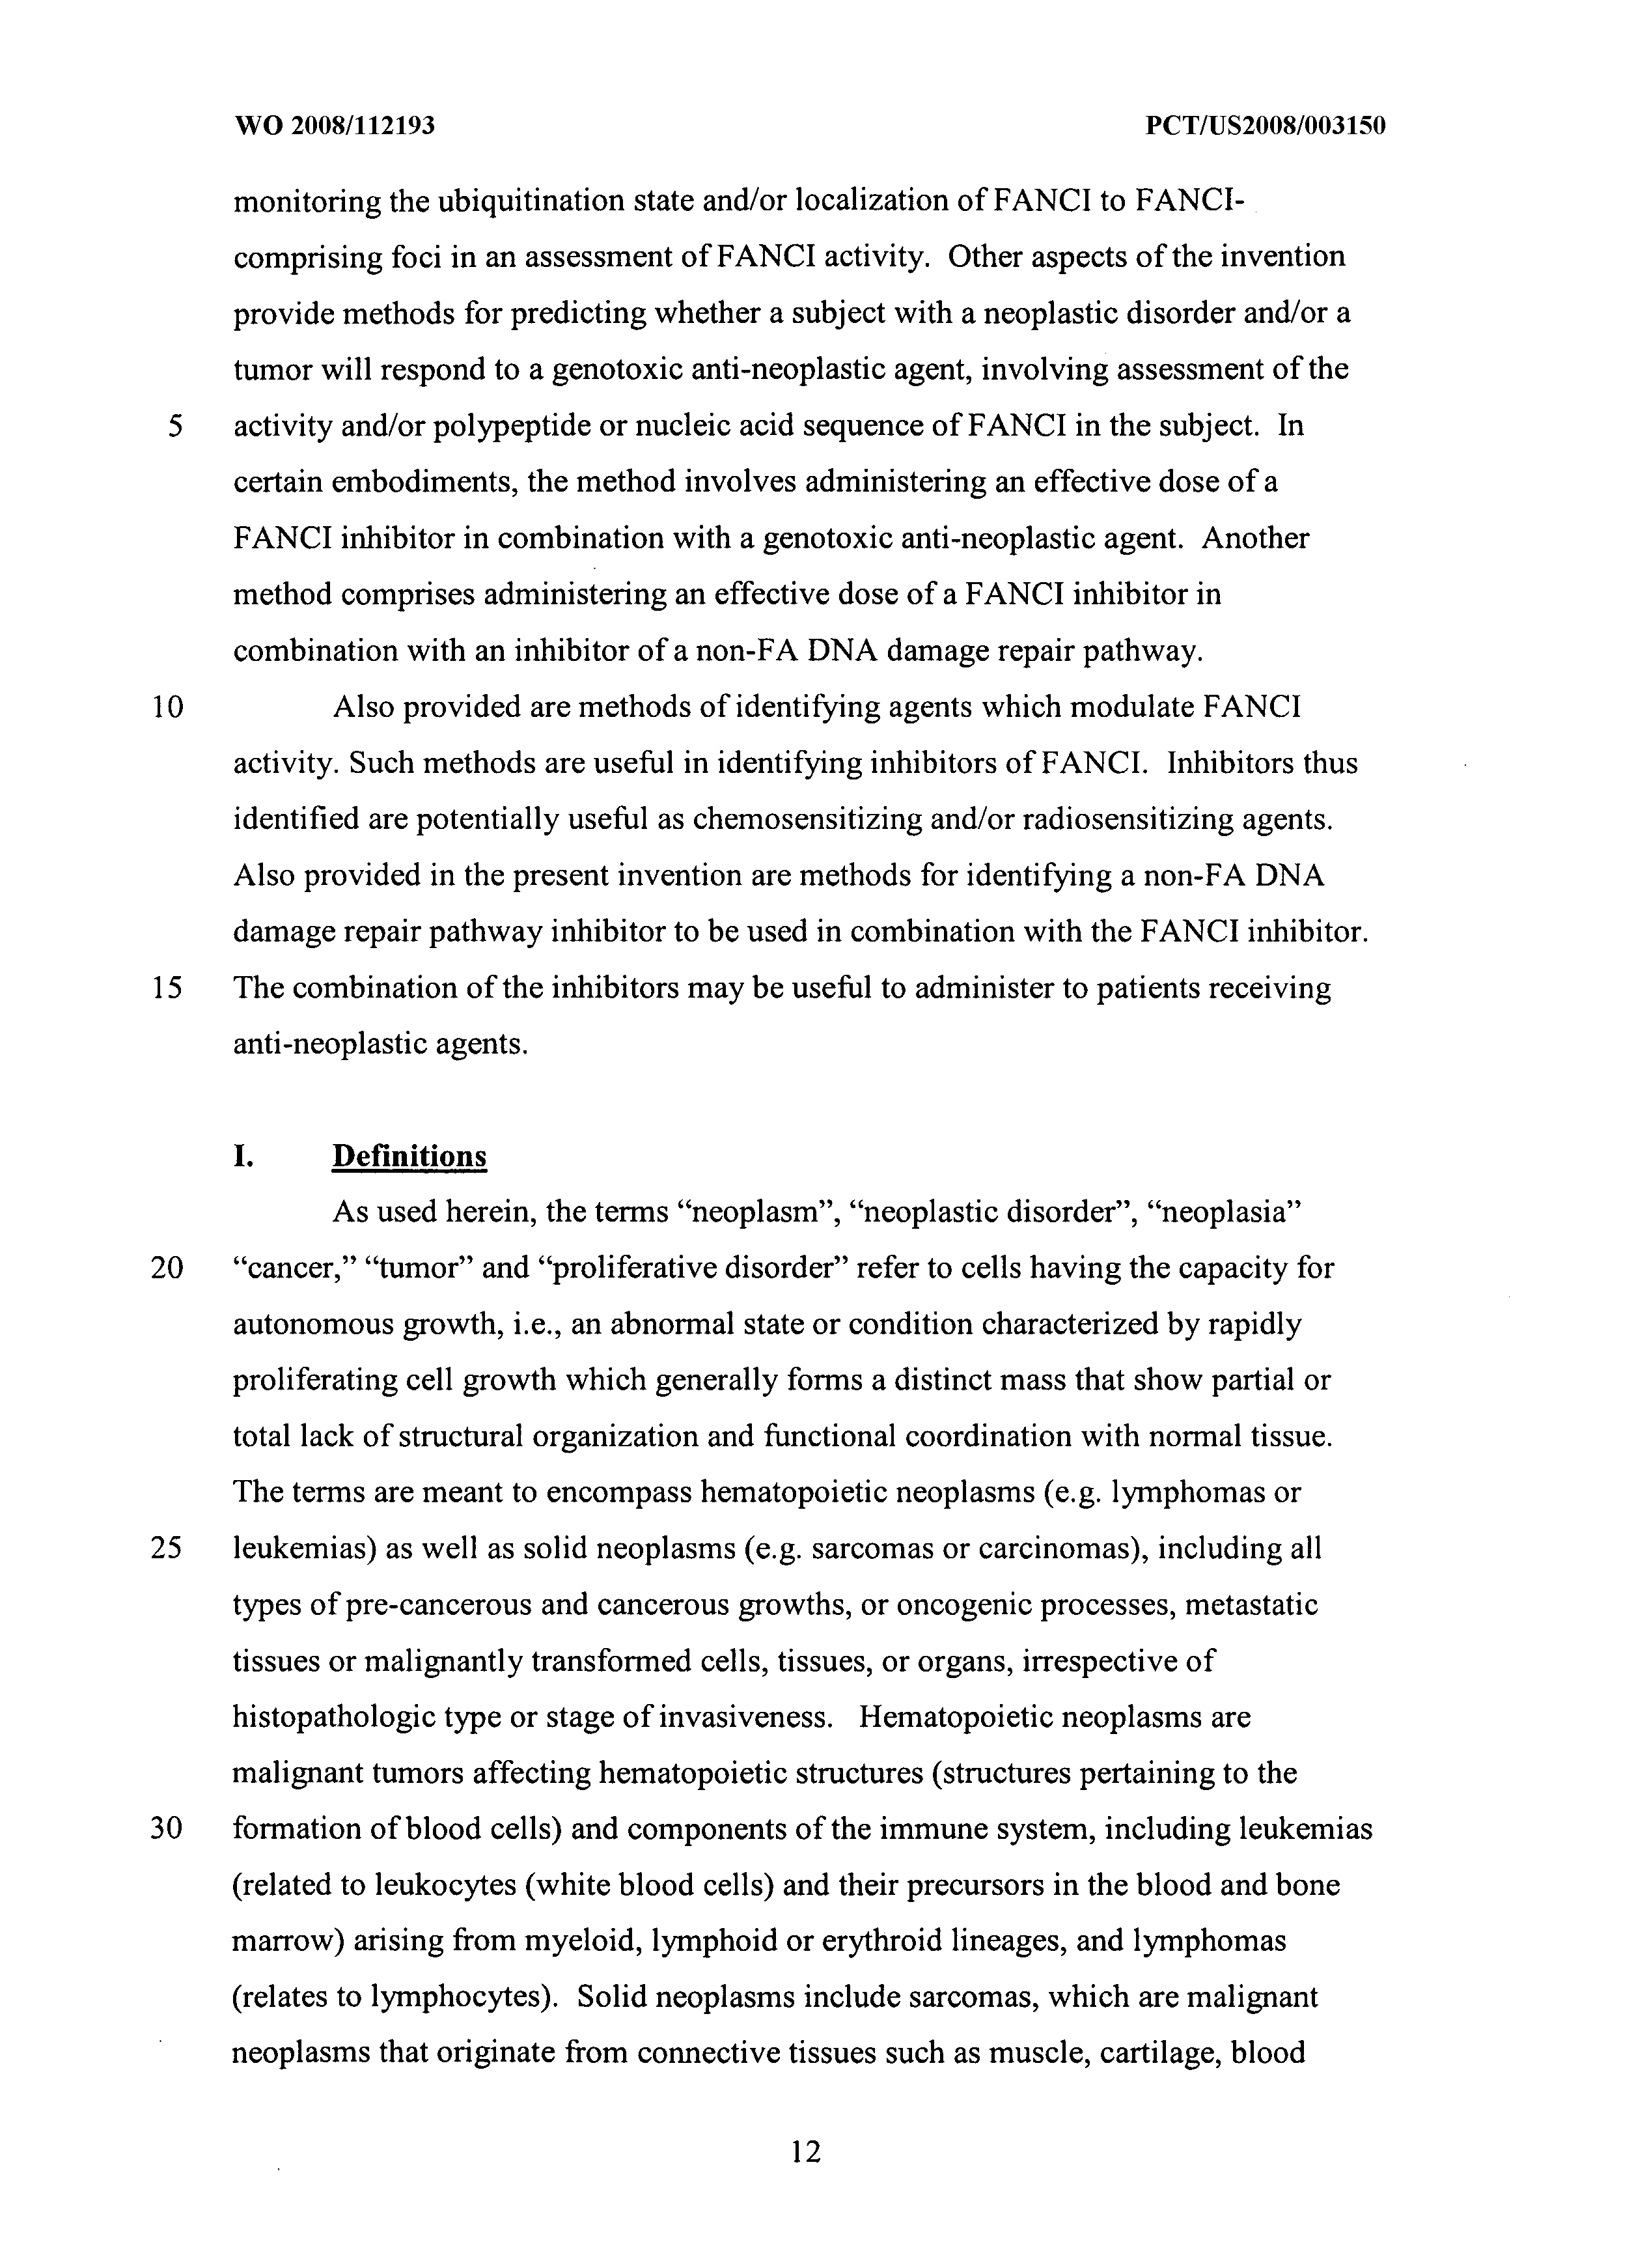 WO 2008/112193 A1 - Prognostic, Diagnostic, And Cancer